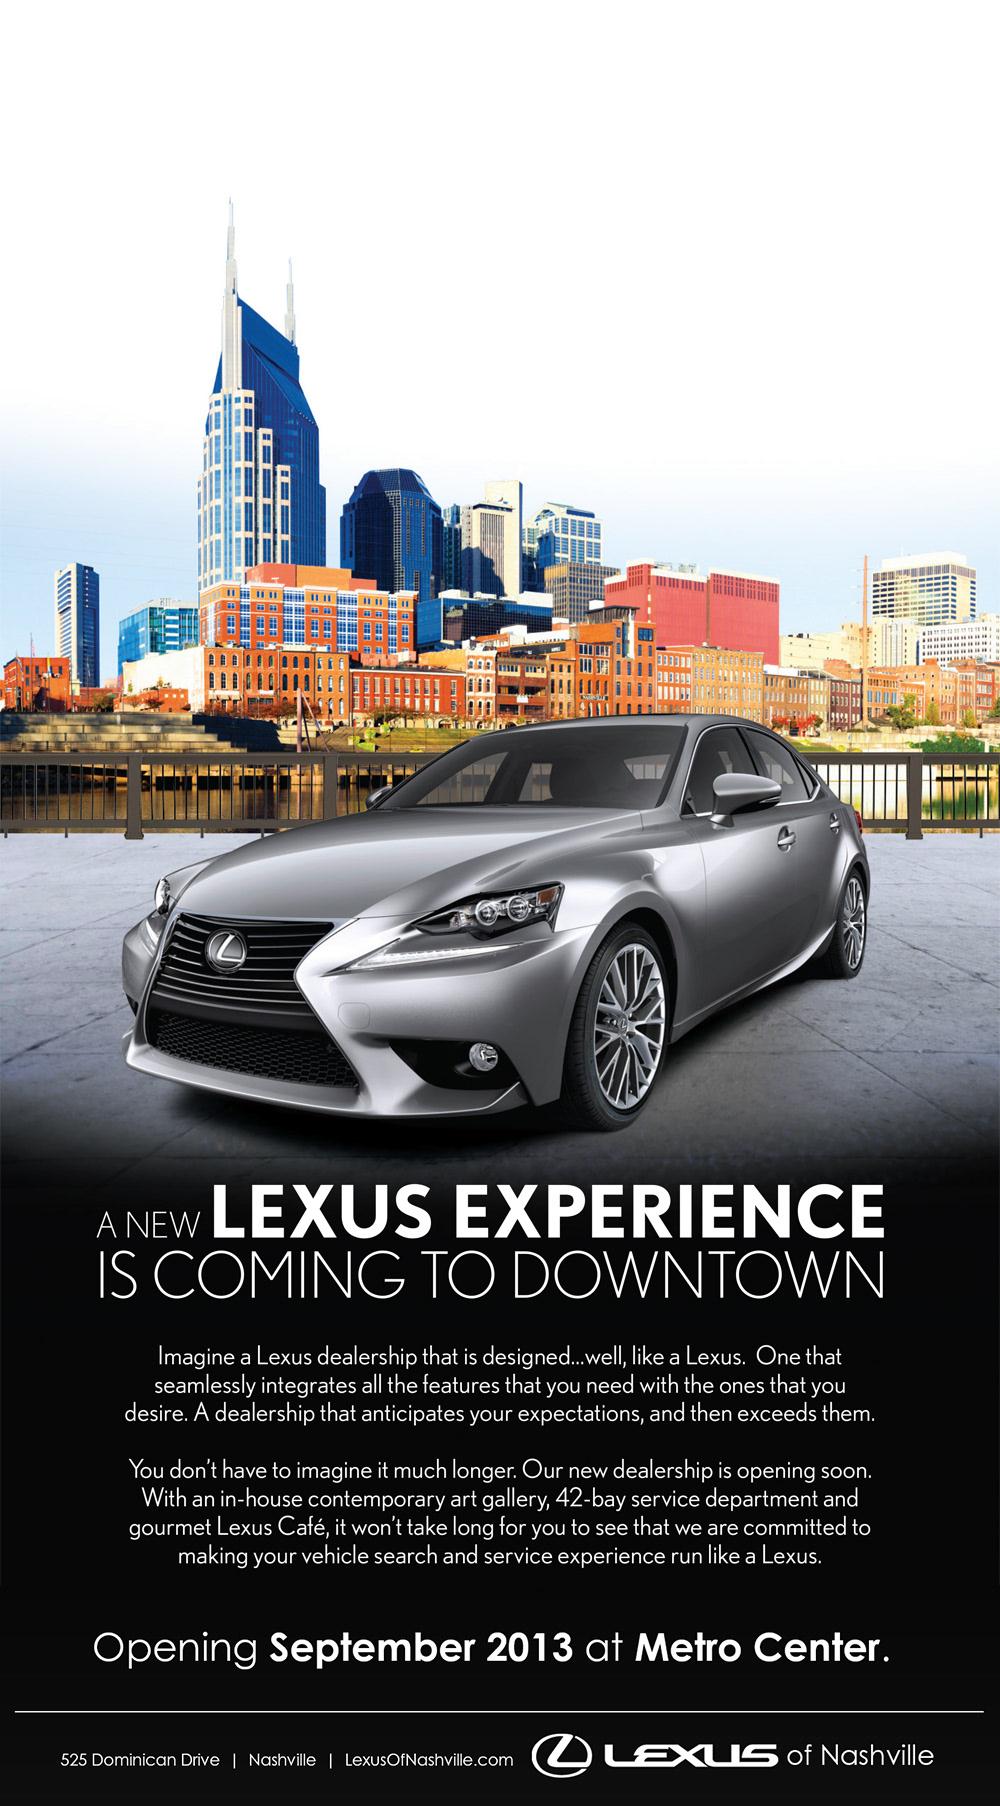 Edward Hauser - Lexus of Nashville